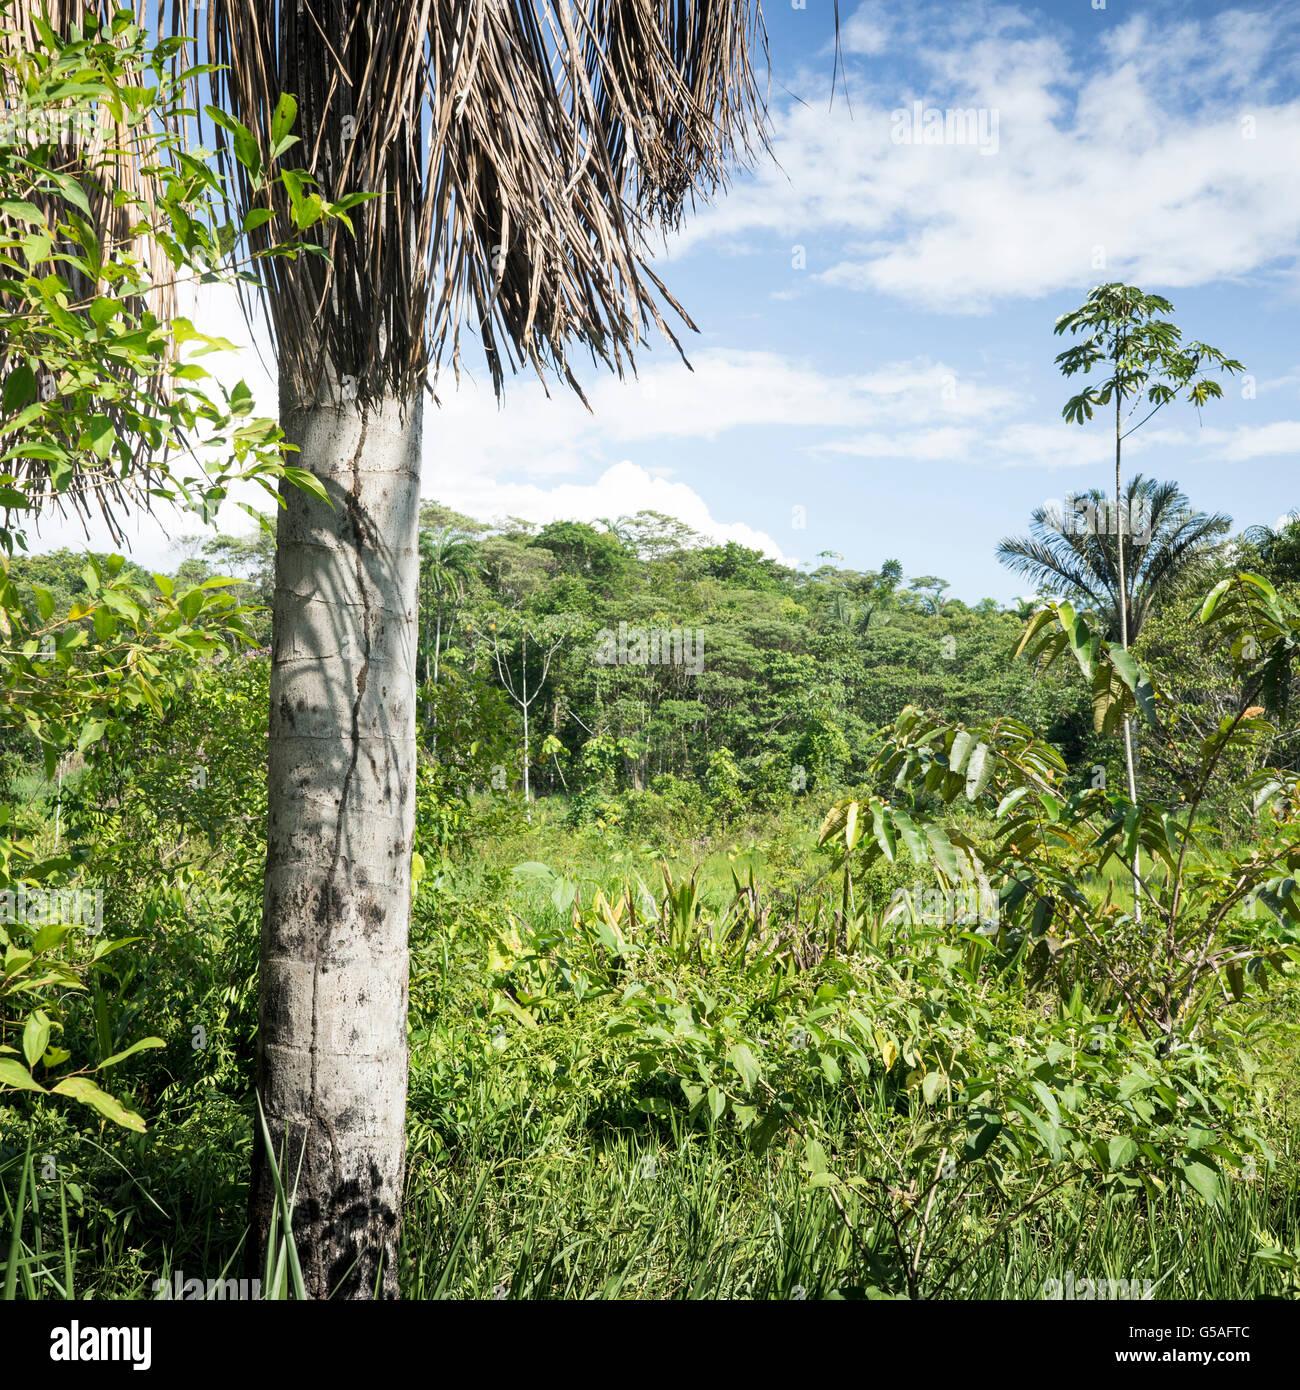 La selva del Amazonas, Loreto, Perú Imagen De Stock